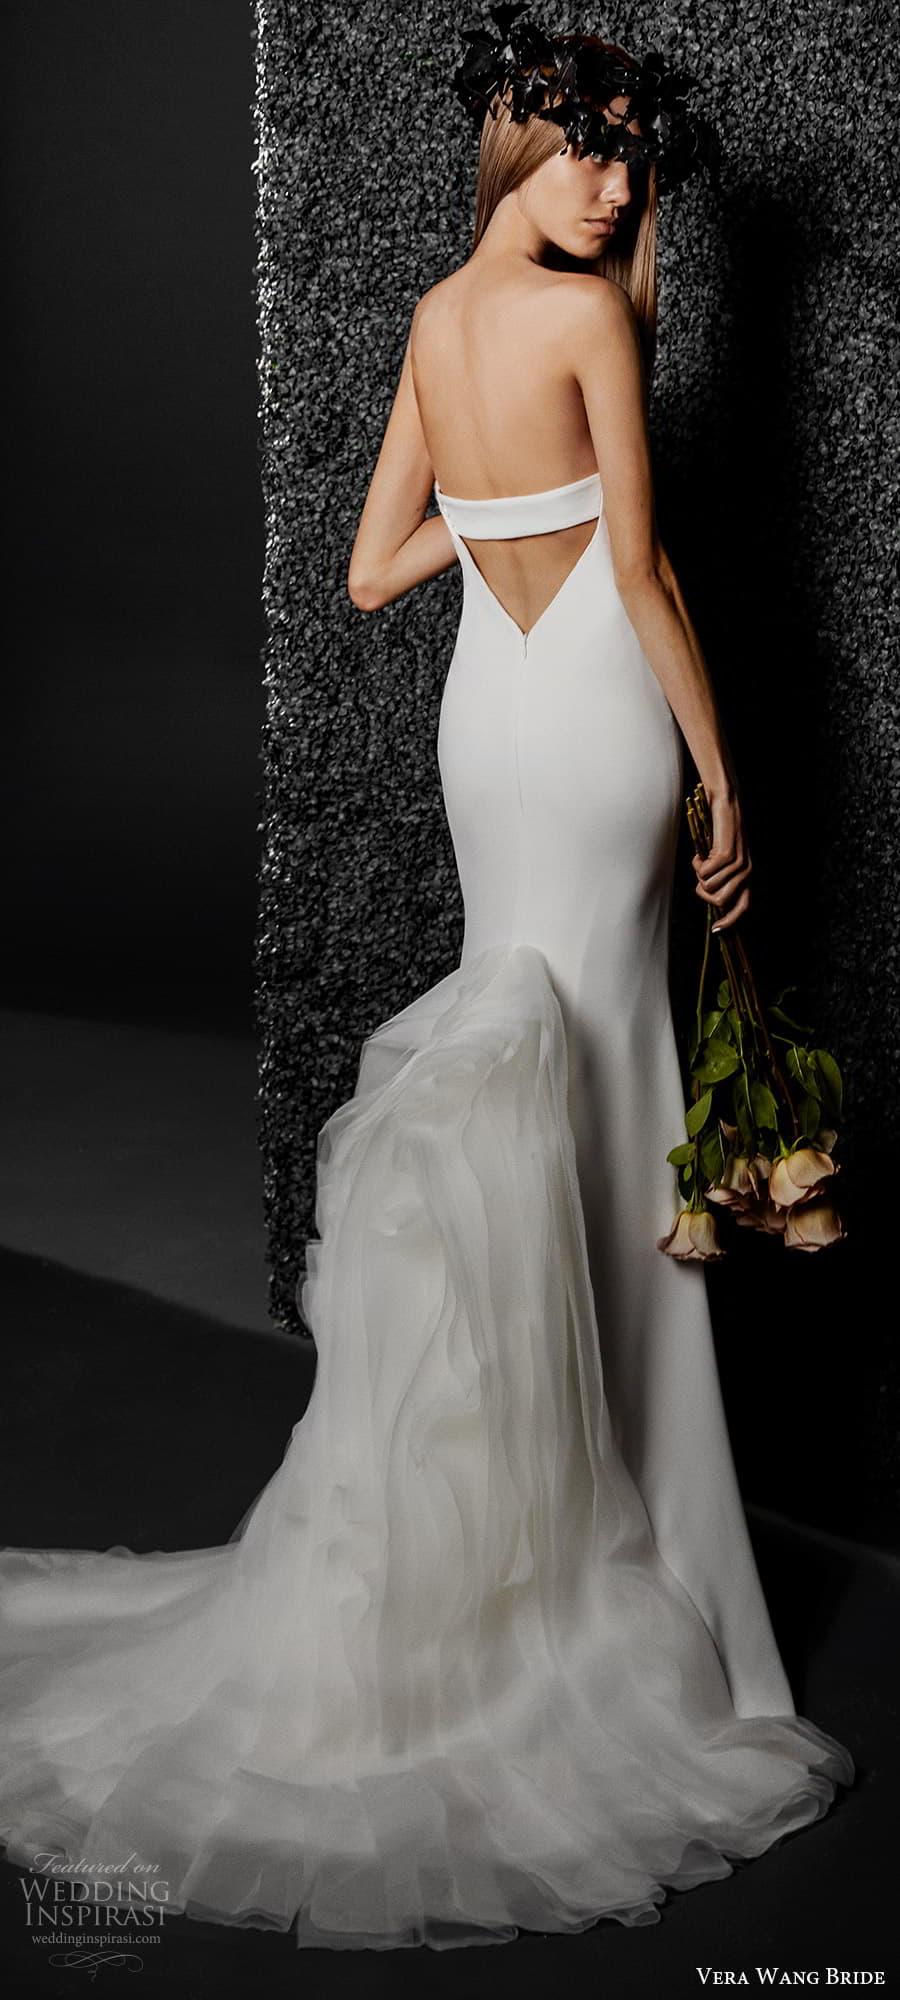 vera wang bride pronovias fall 2021 bridal strapless sweetheart clean minimalist mermaid wedding dress flange skirt chapel train (26) mv